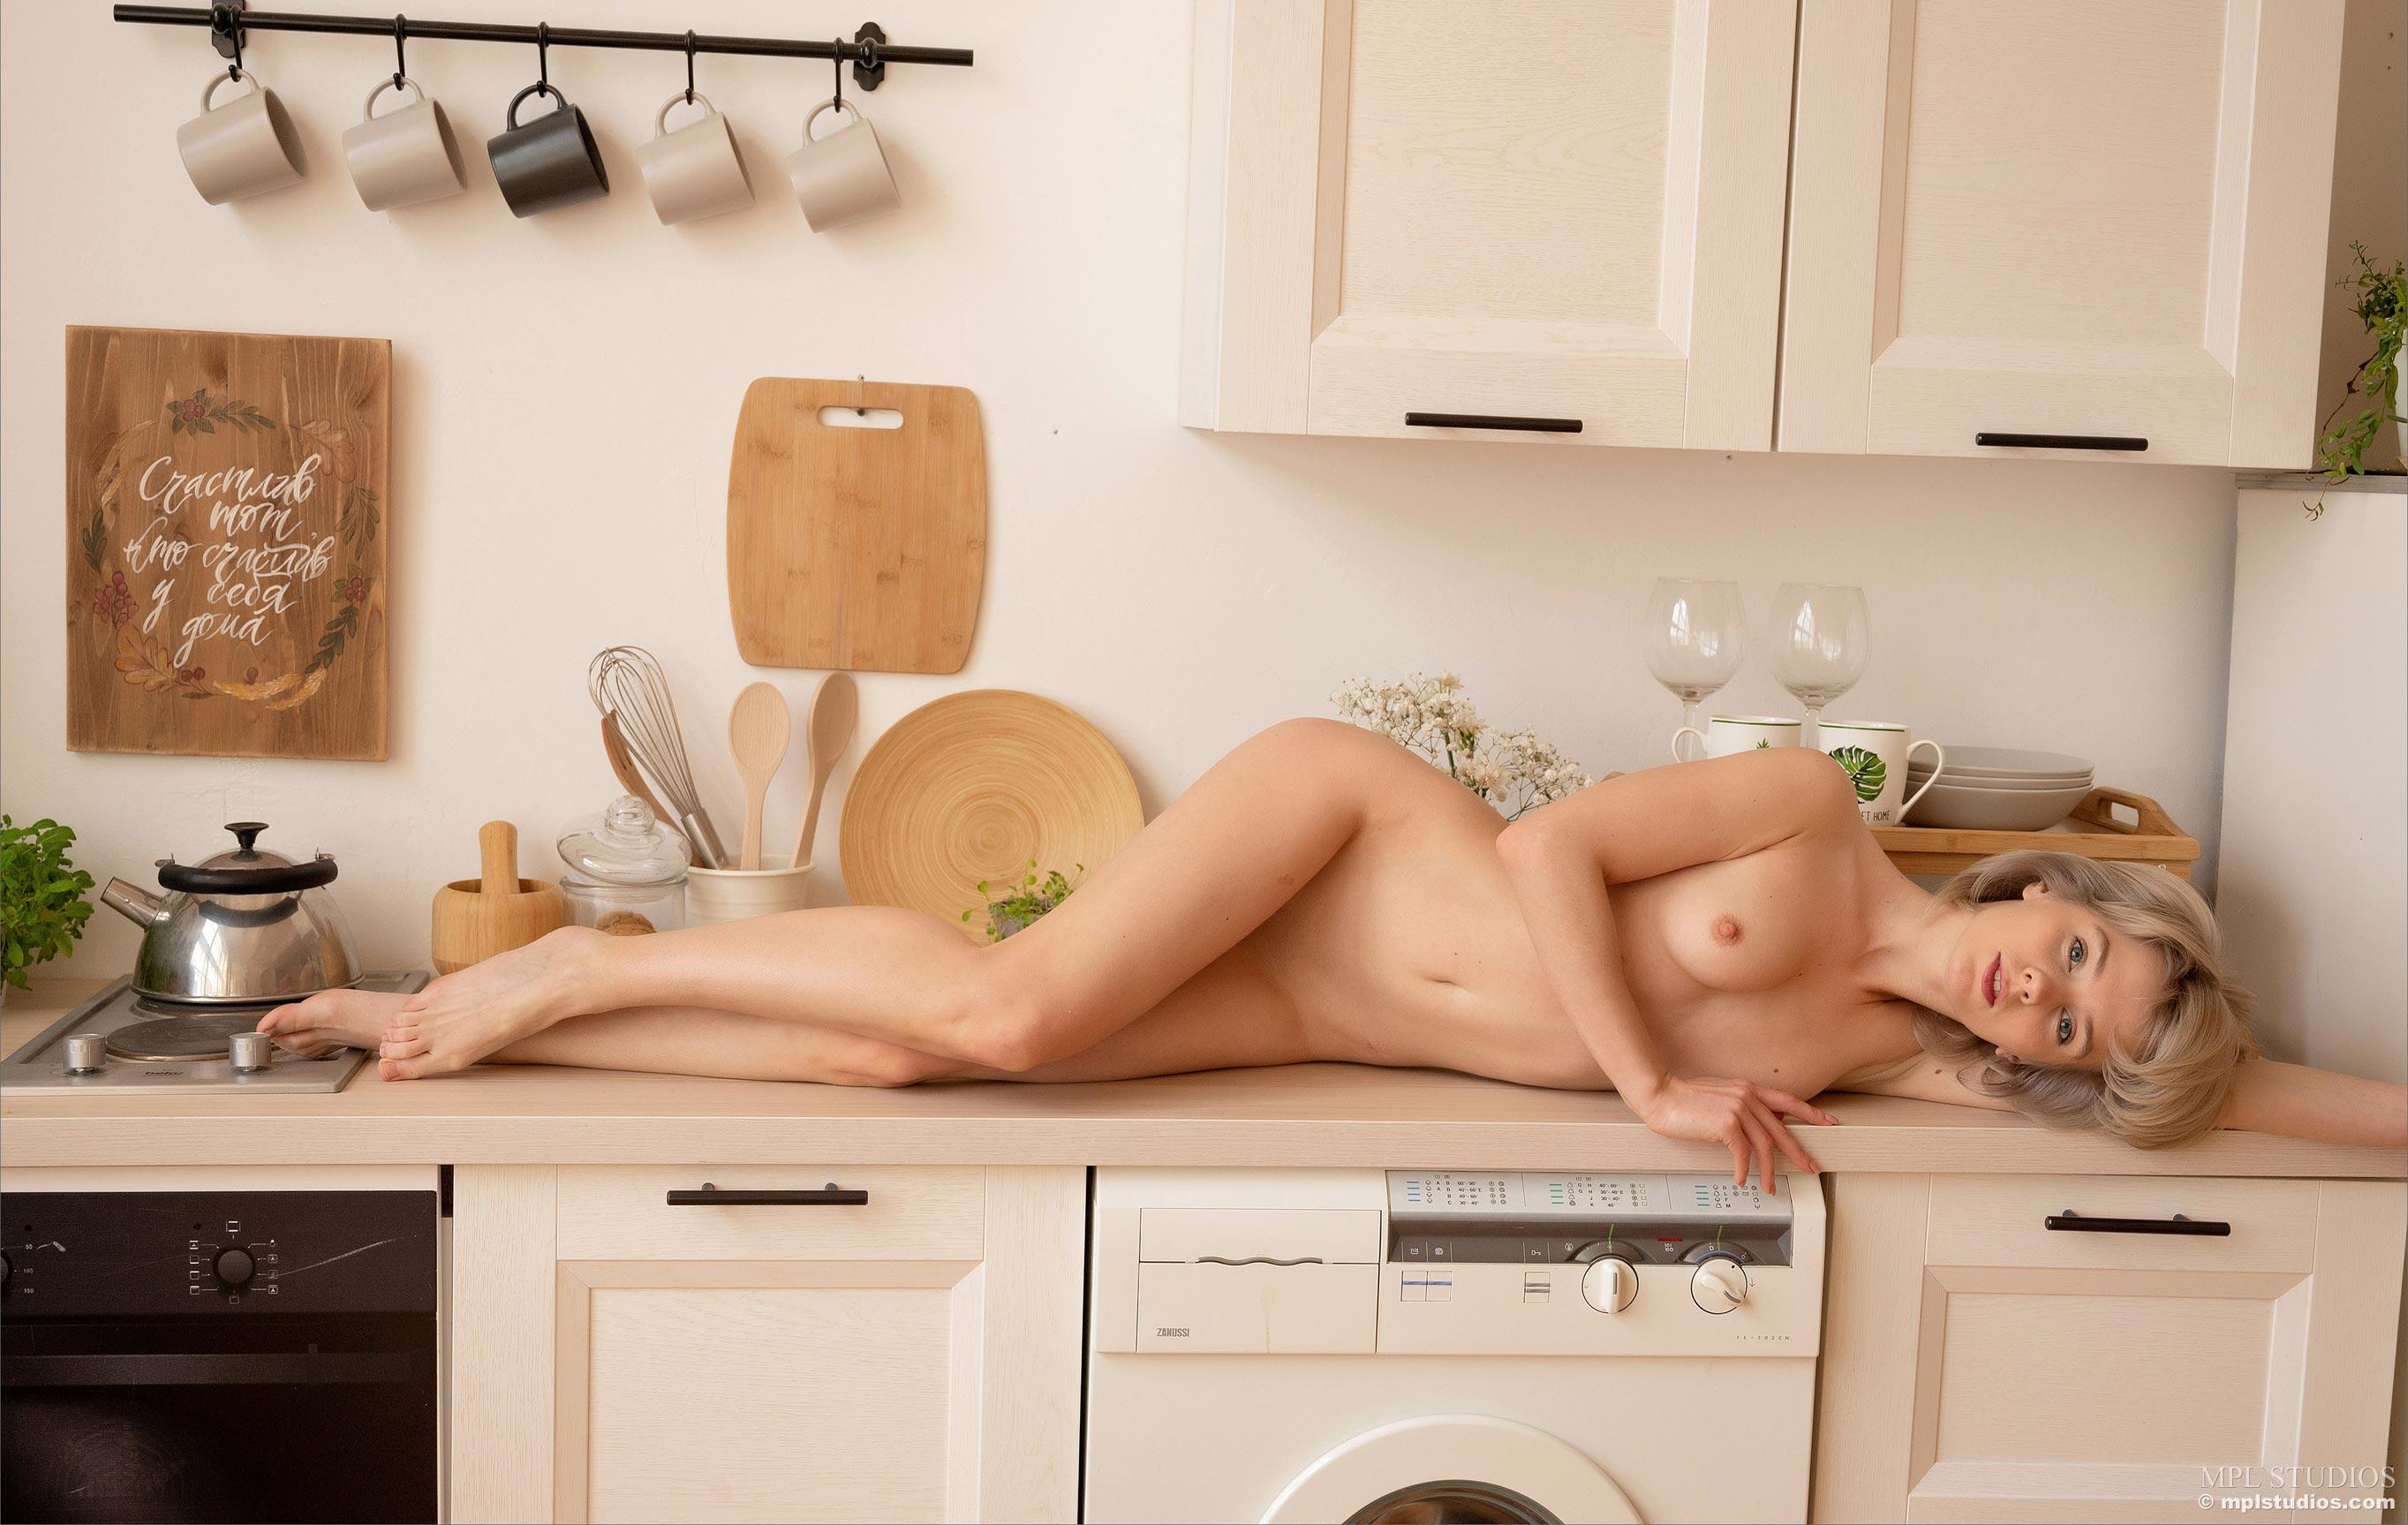 начинающая домохозяйка Марта Громова, голая дома / фото 01